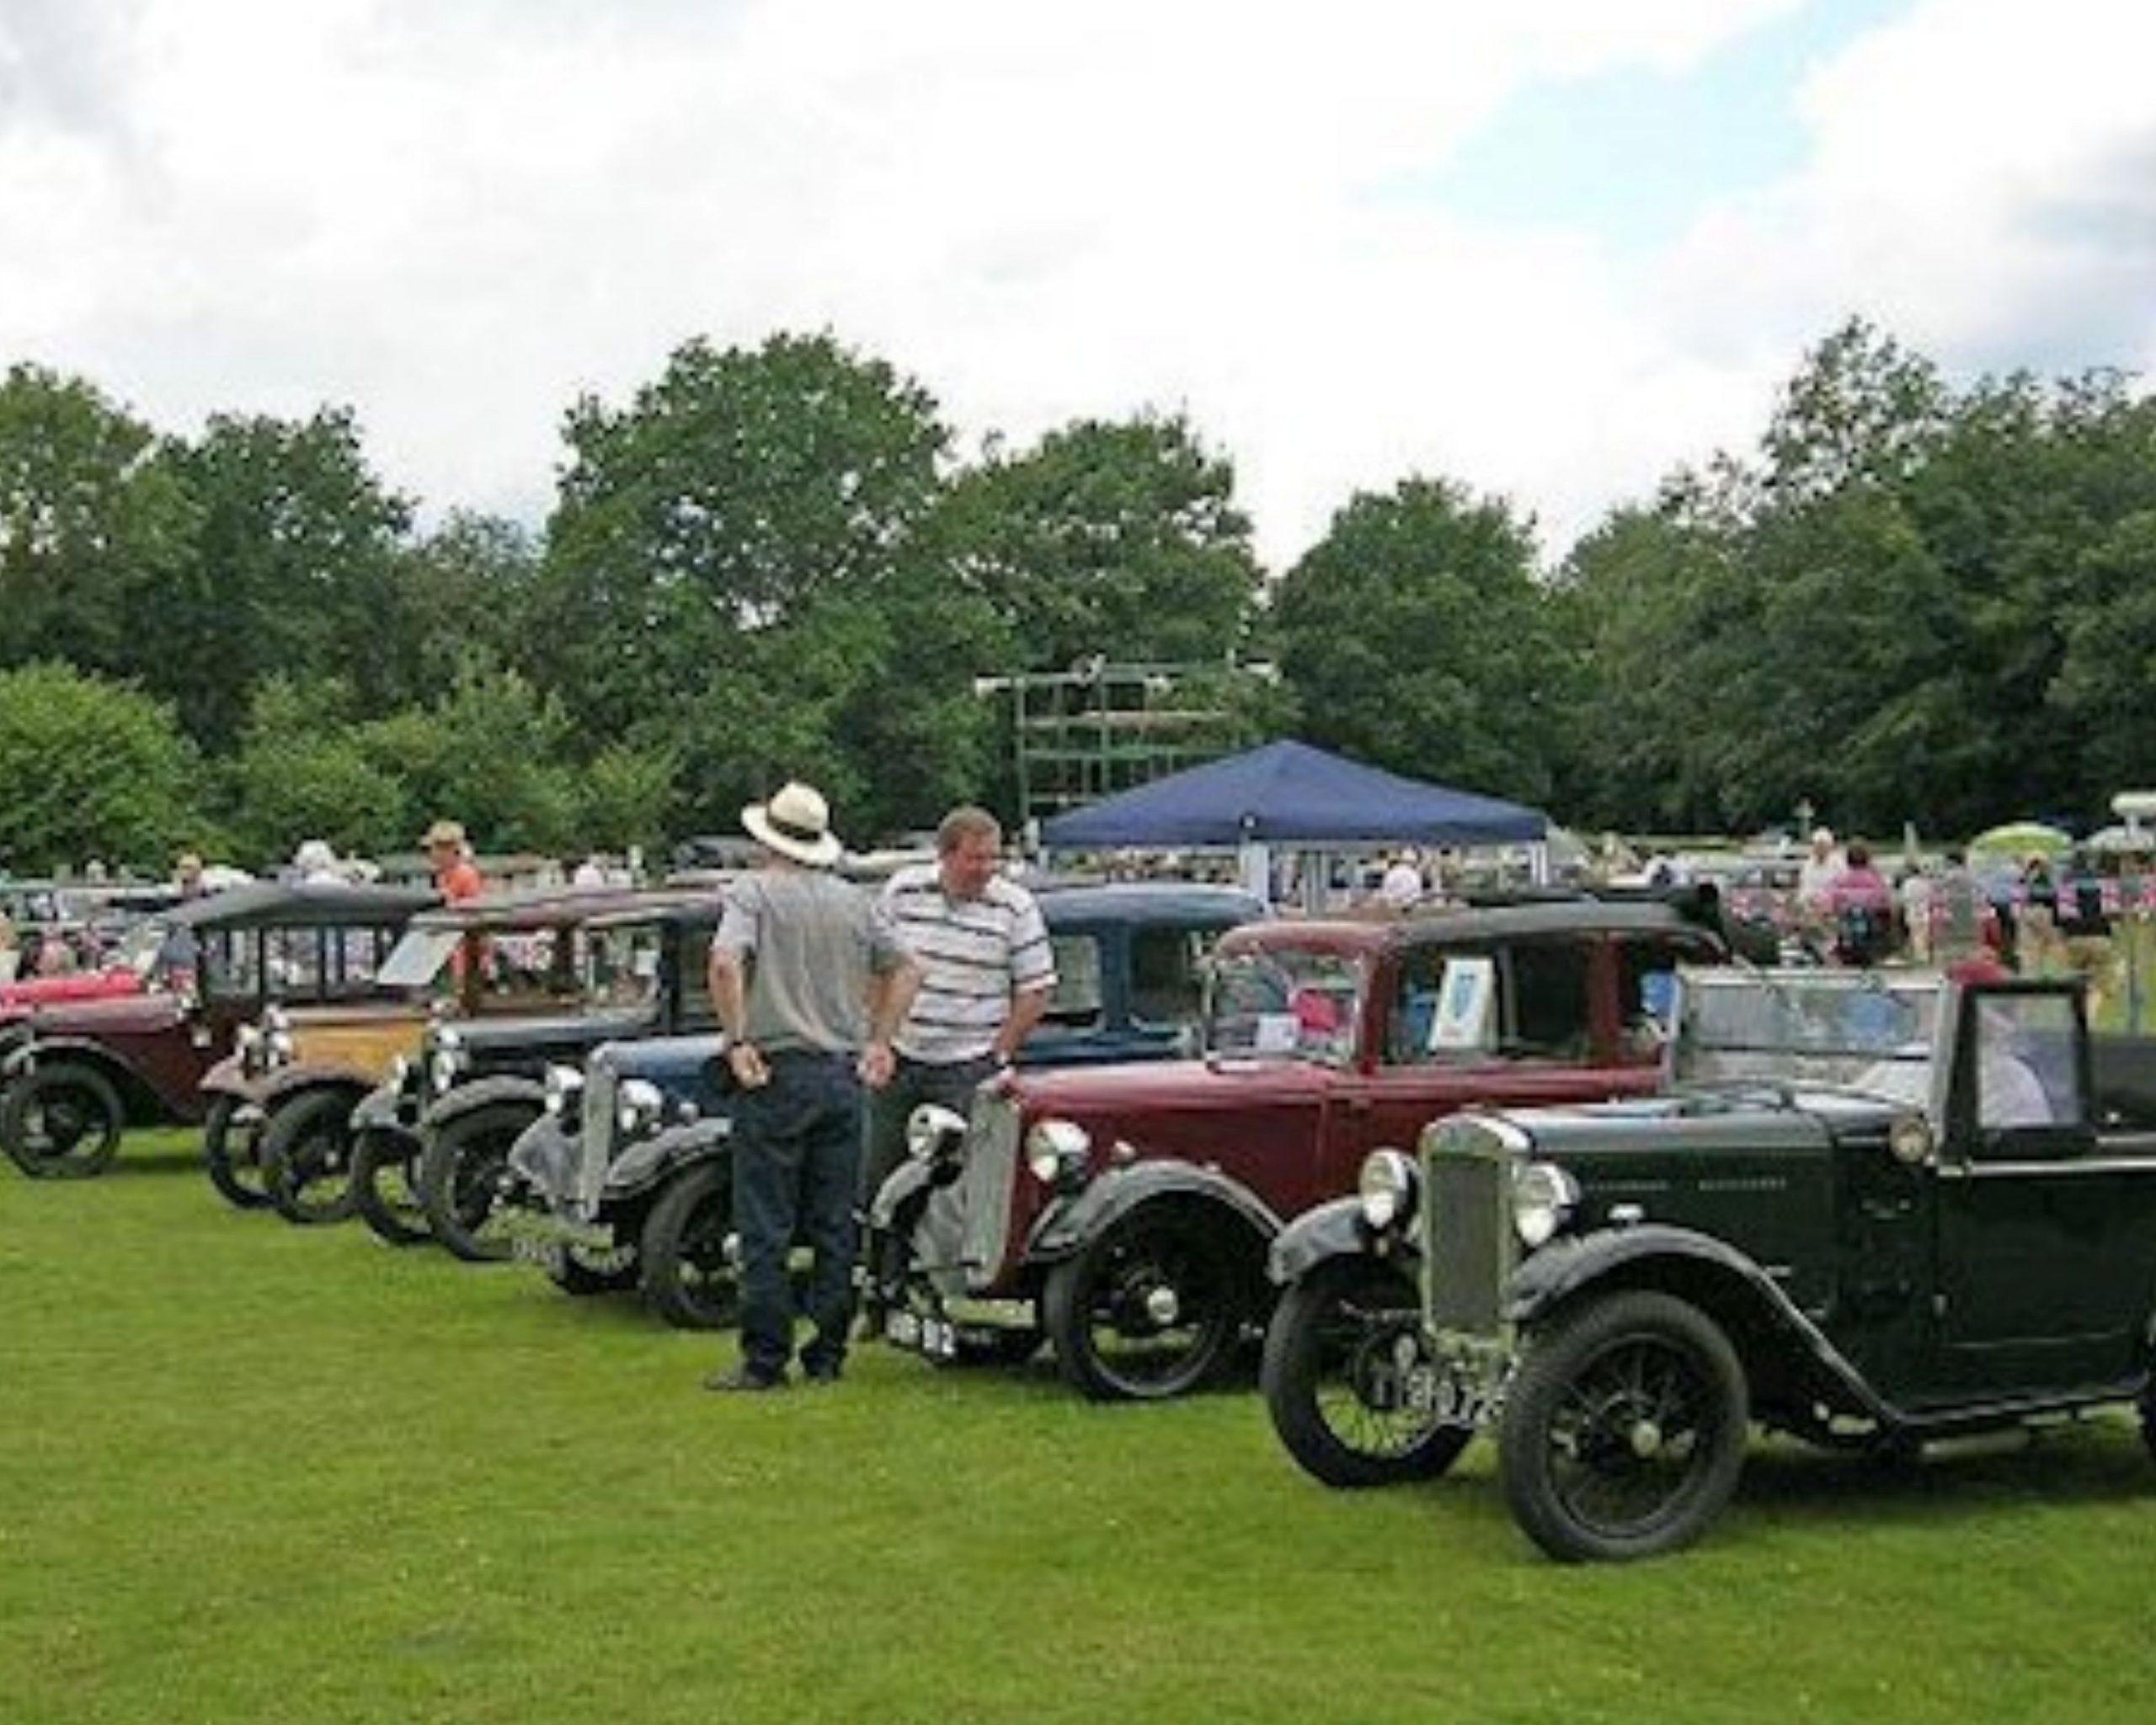 Vintage car rally gathering